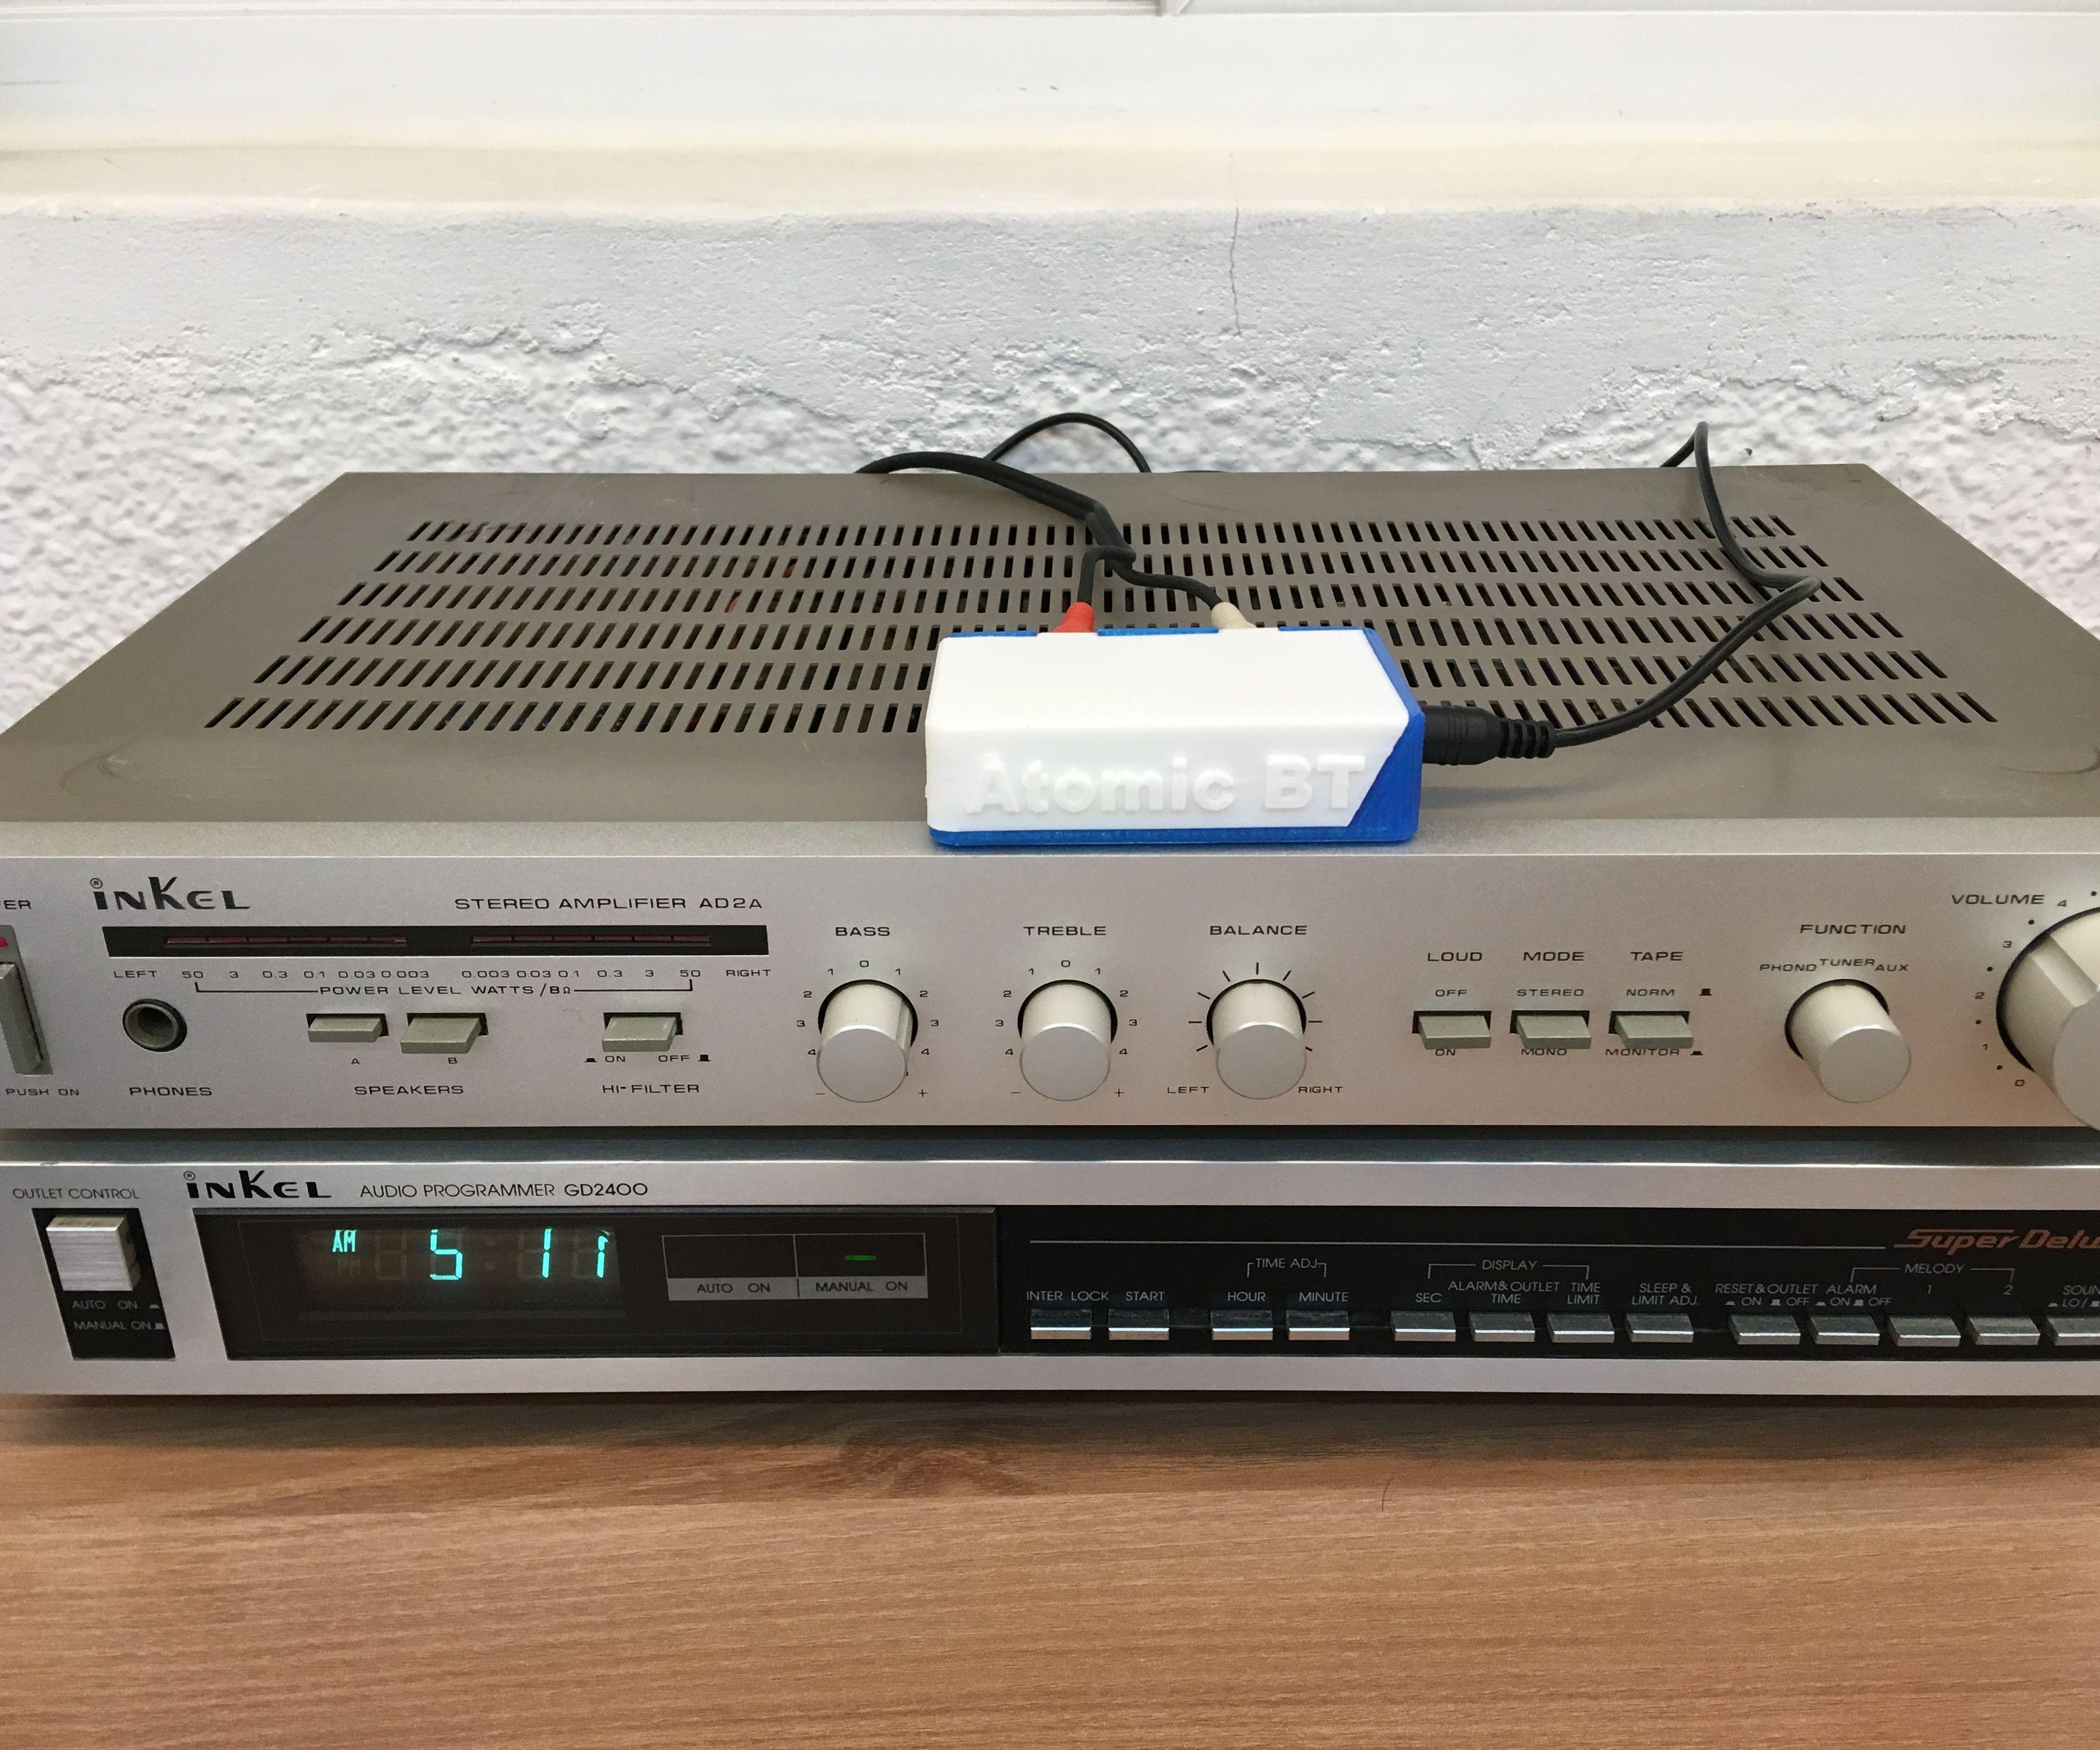 Transforming Vintage Hi-Fi Into a Bluetooth Audio System